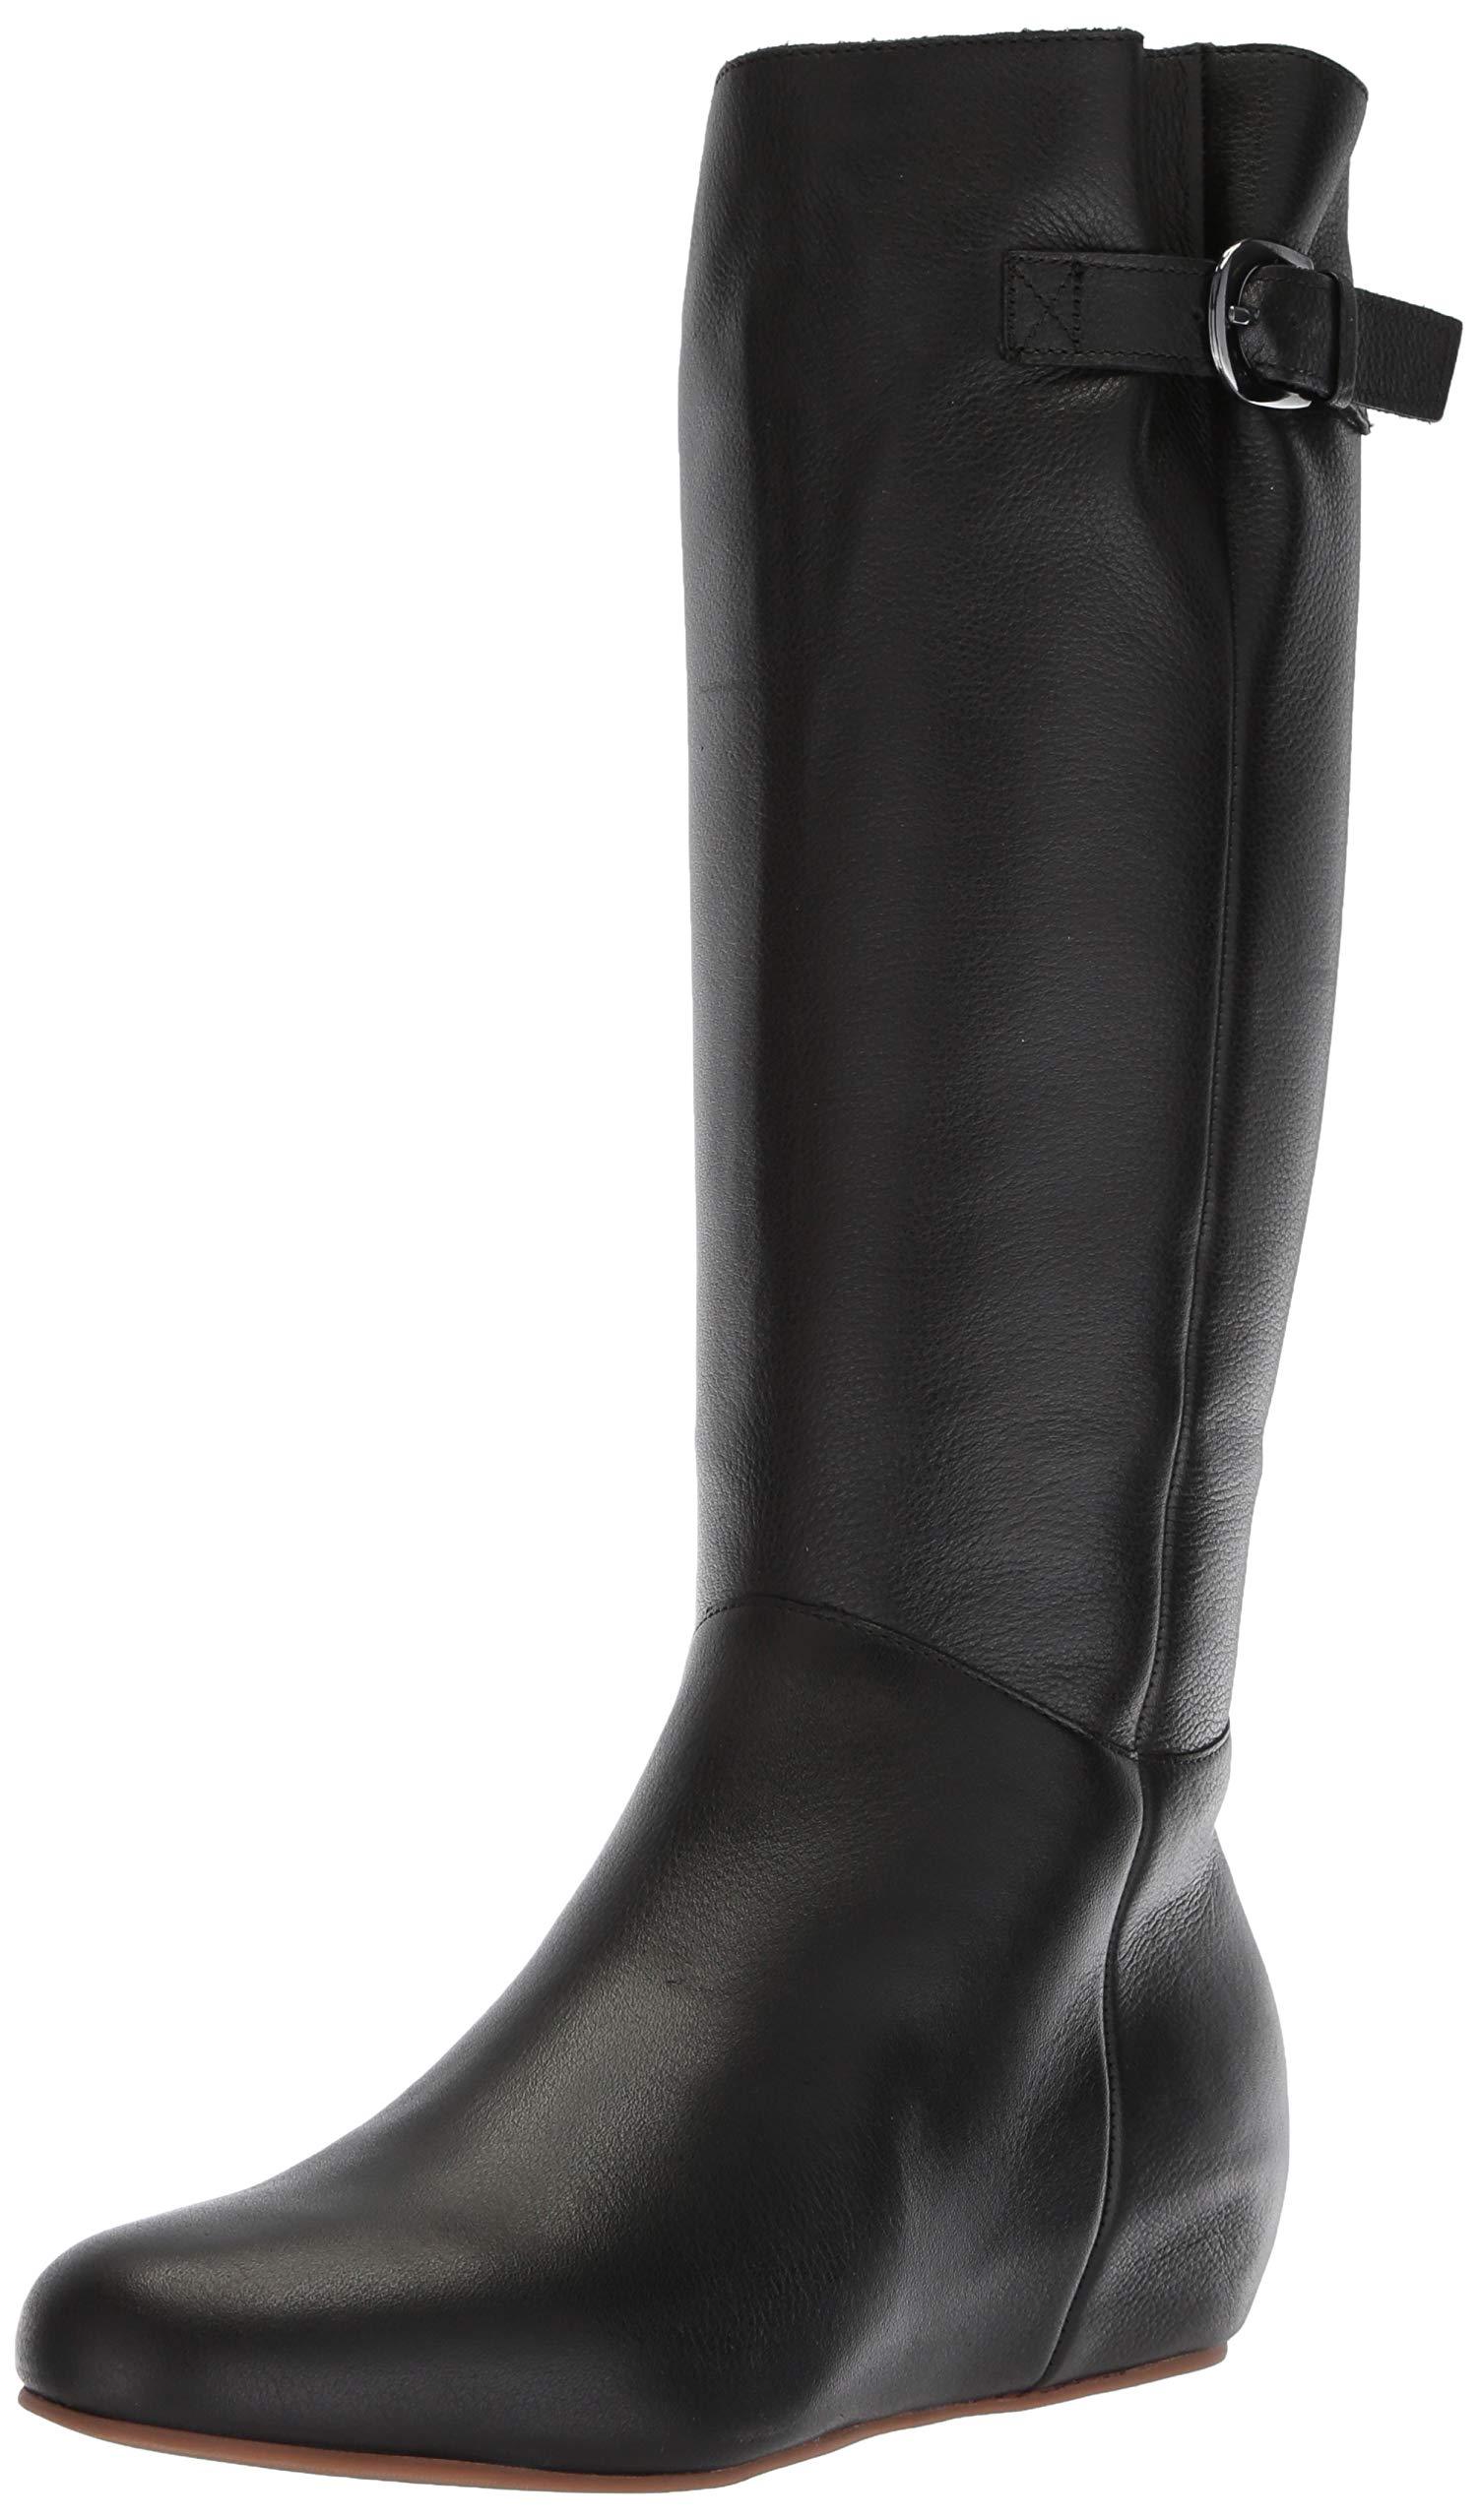 Blondo Women's Monica Knee High Boot, Black Leather, 8.5 M US by Blondo